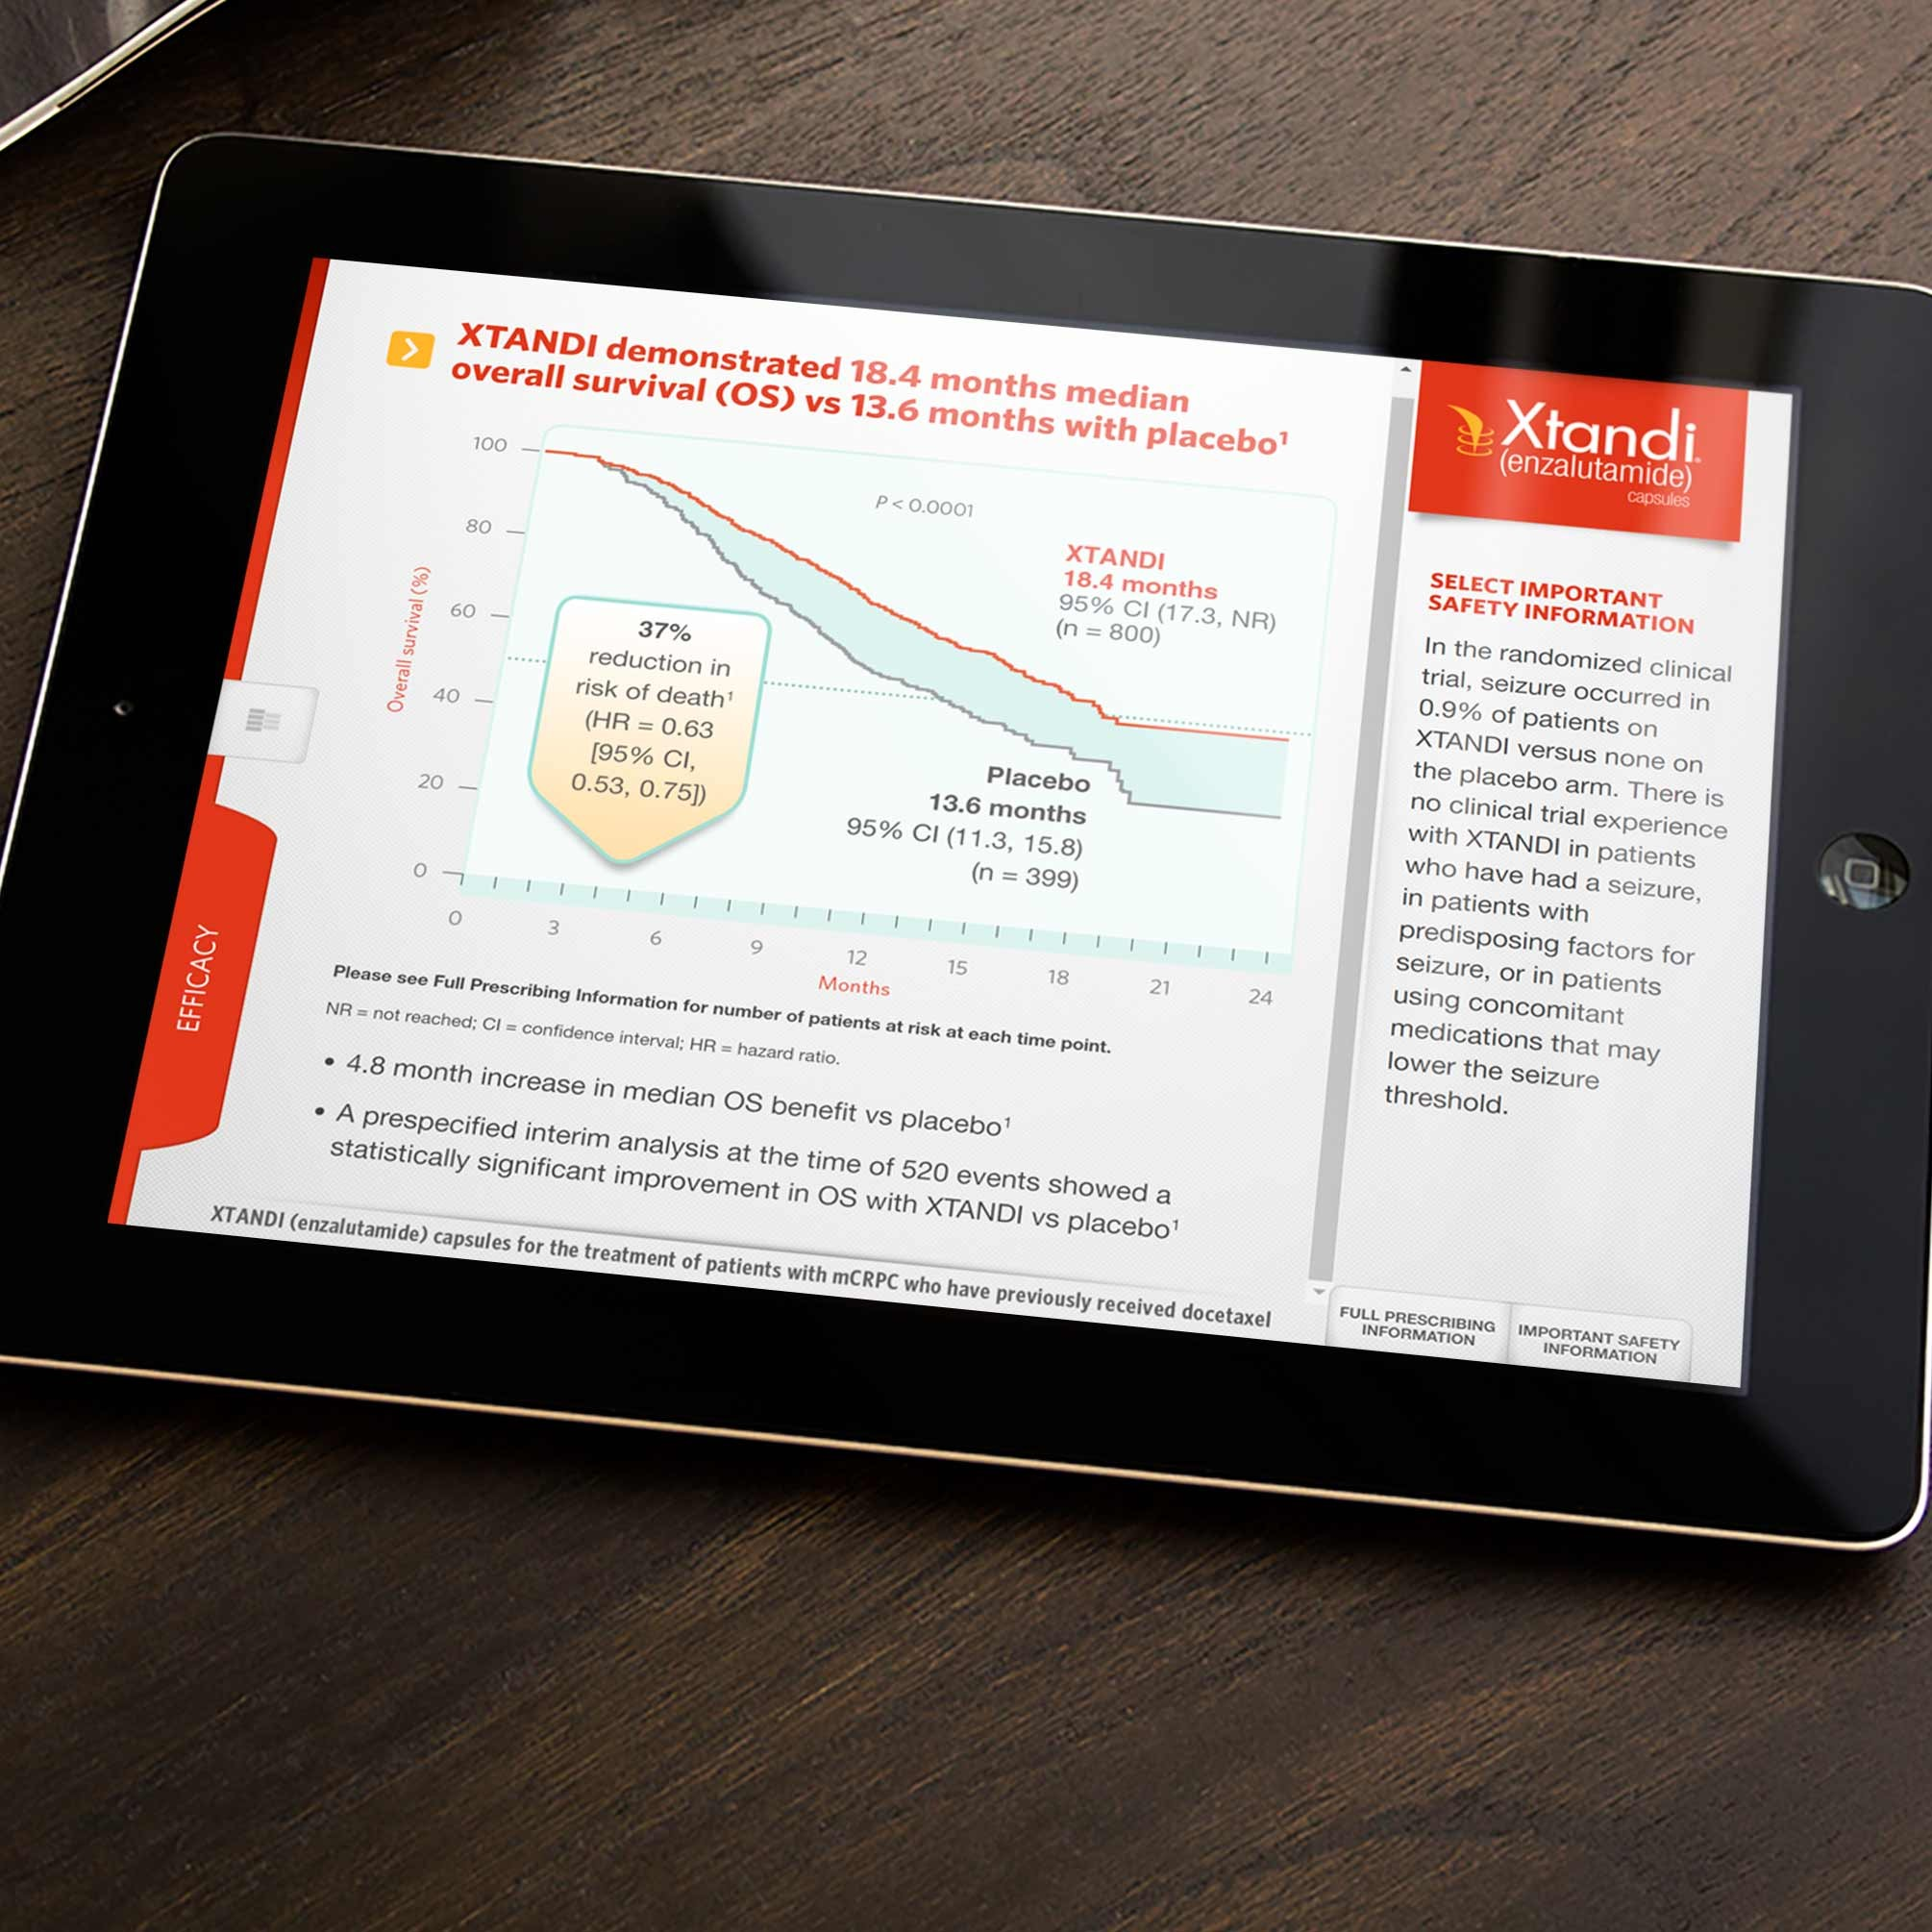 Astellas Interactive IPad Salesforce Sales Aid